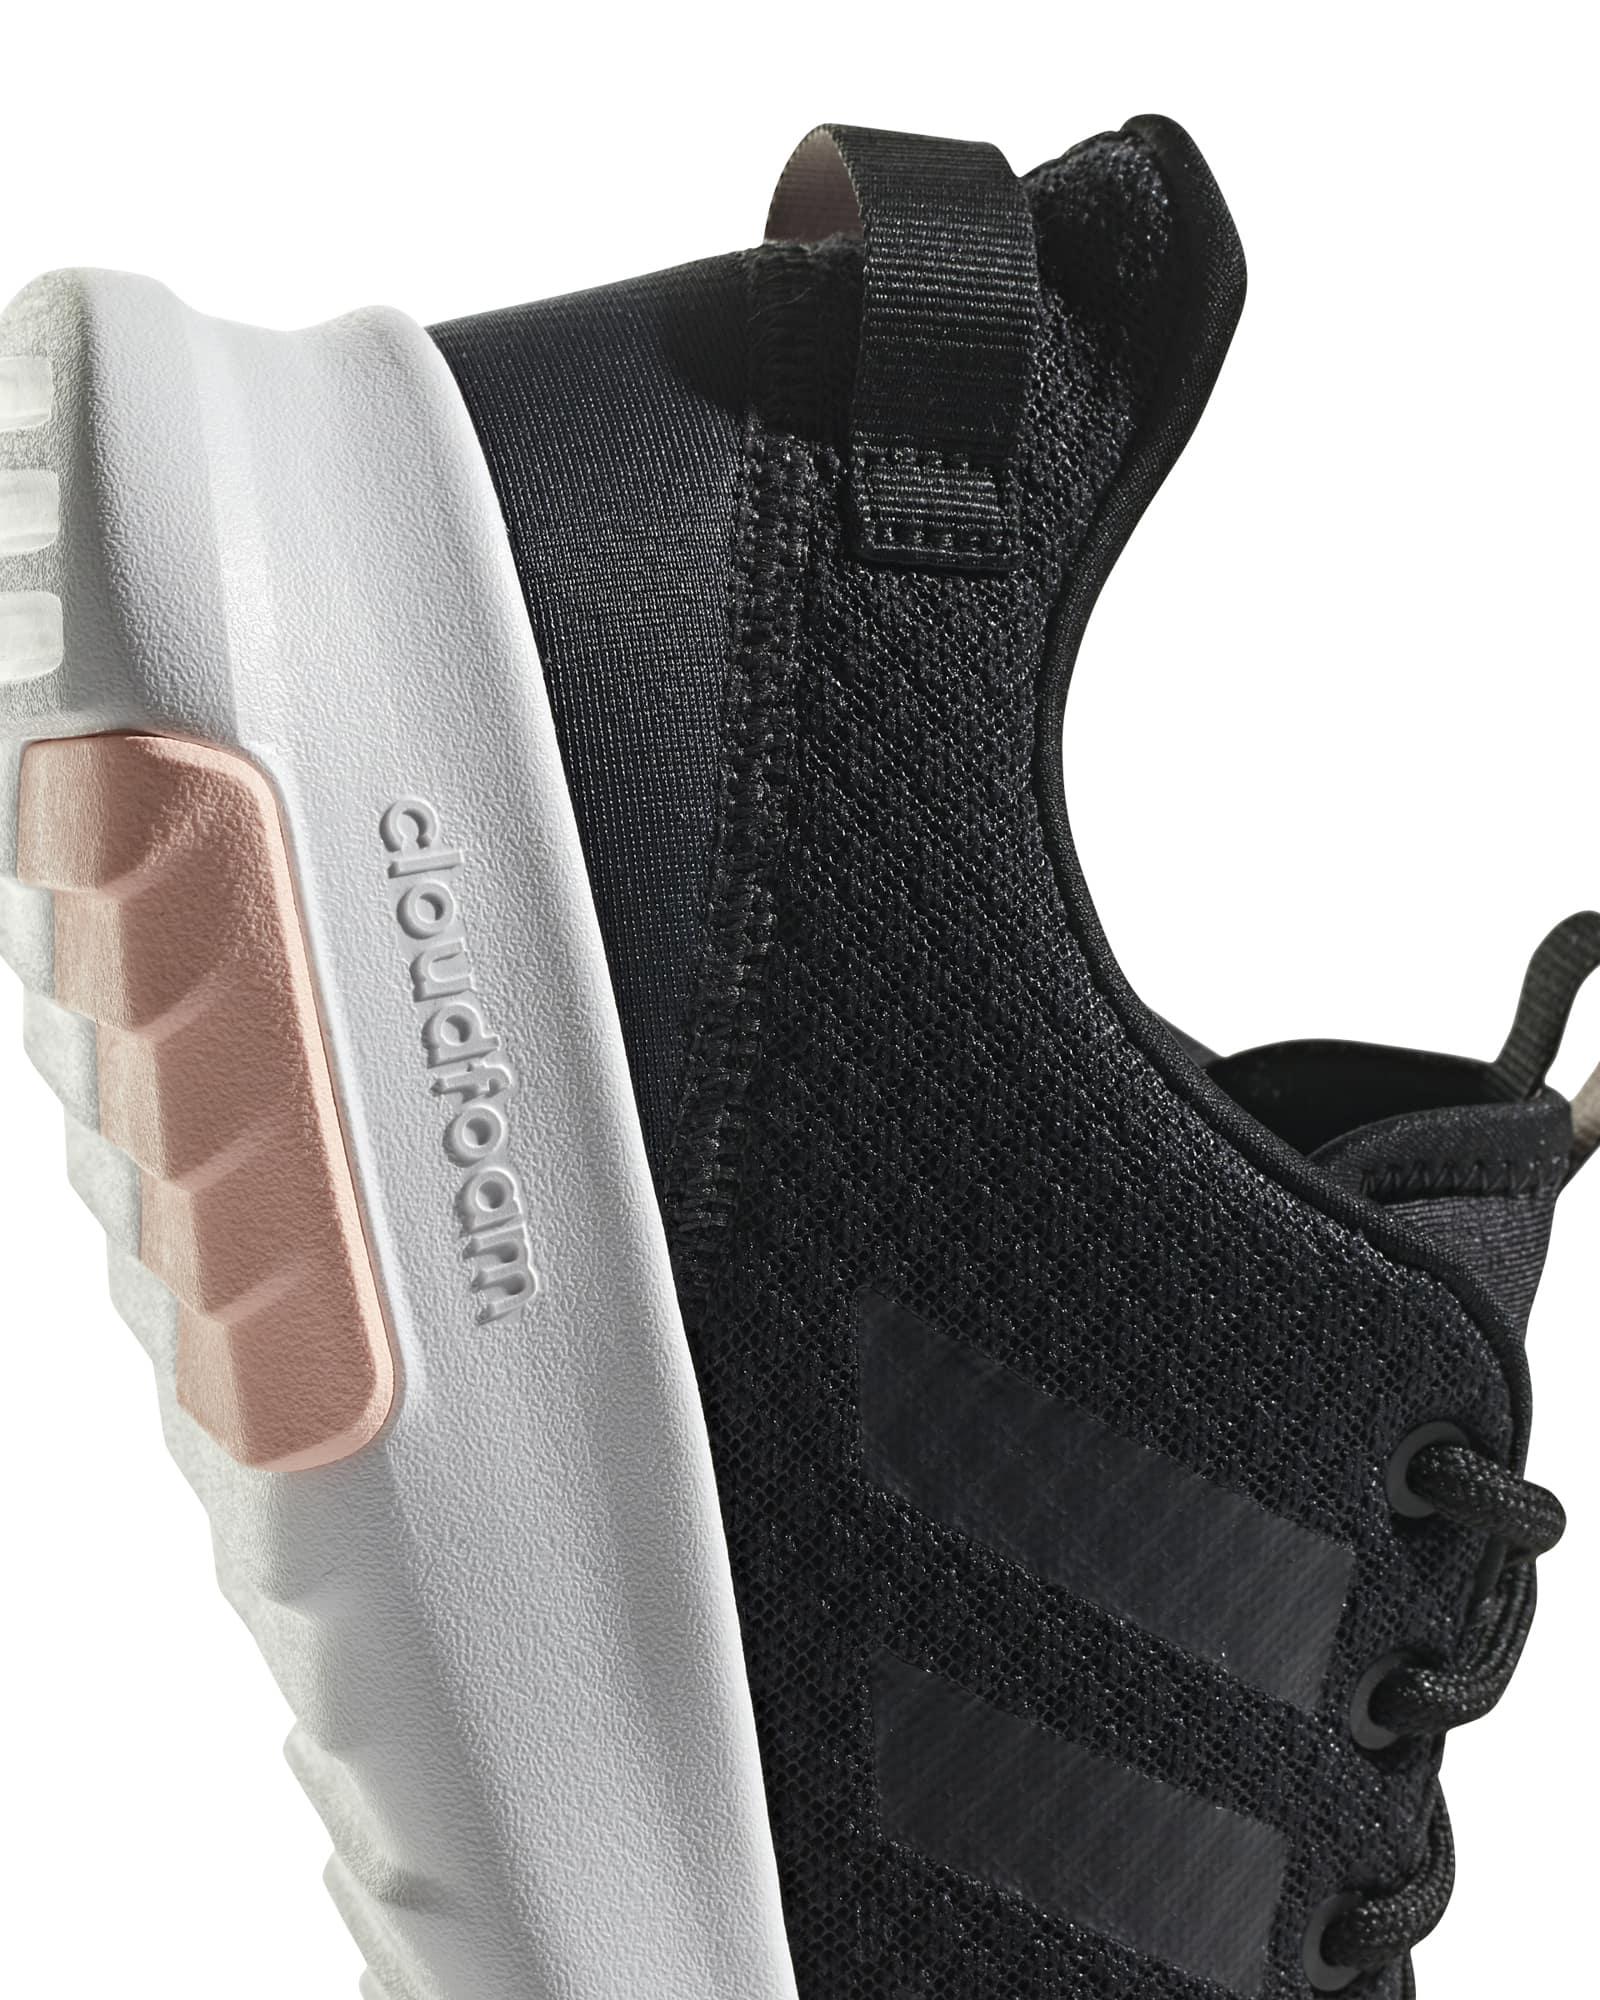 Adidas Cloudfoam Racer TR Black Tights.no